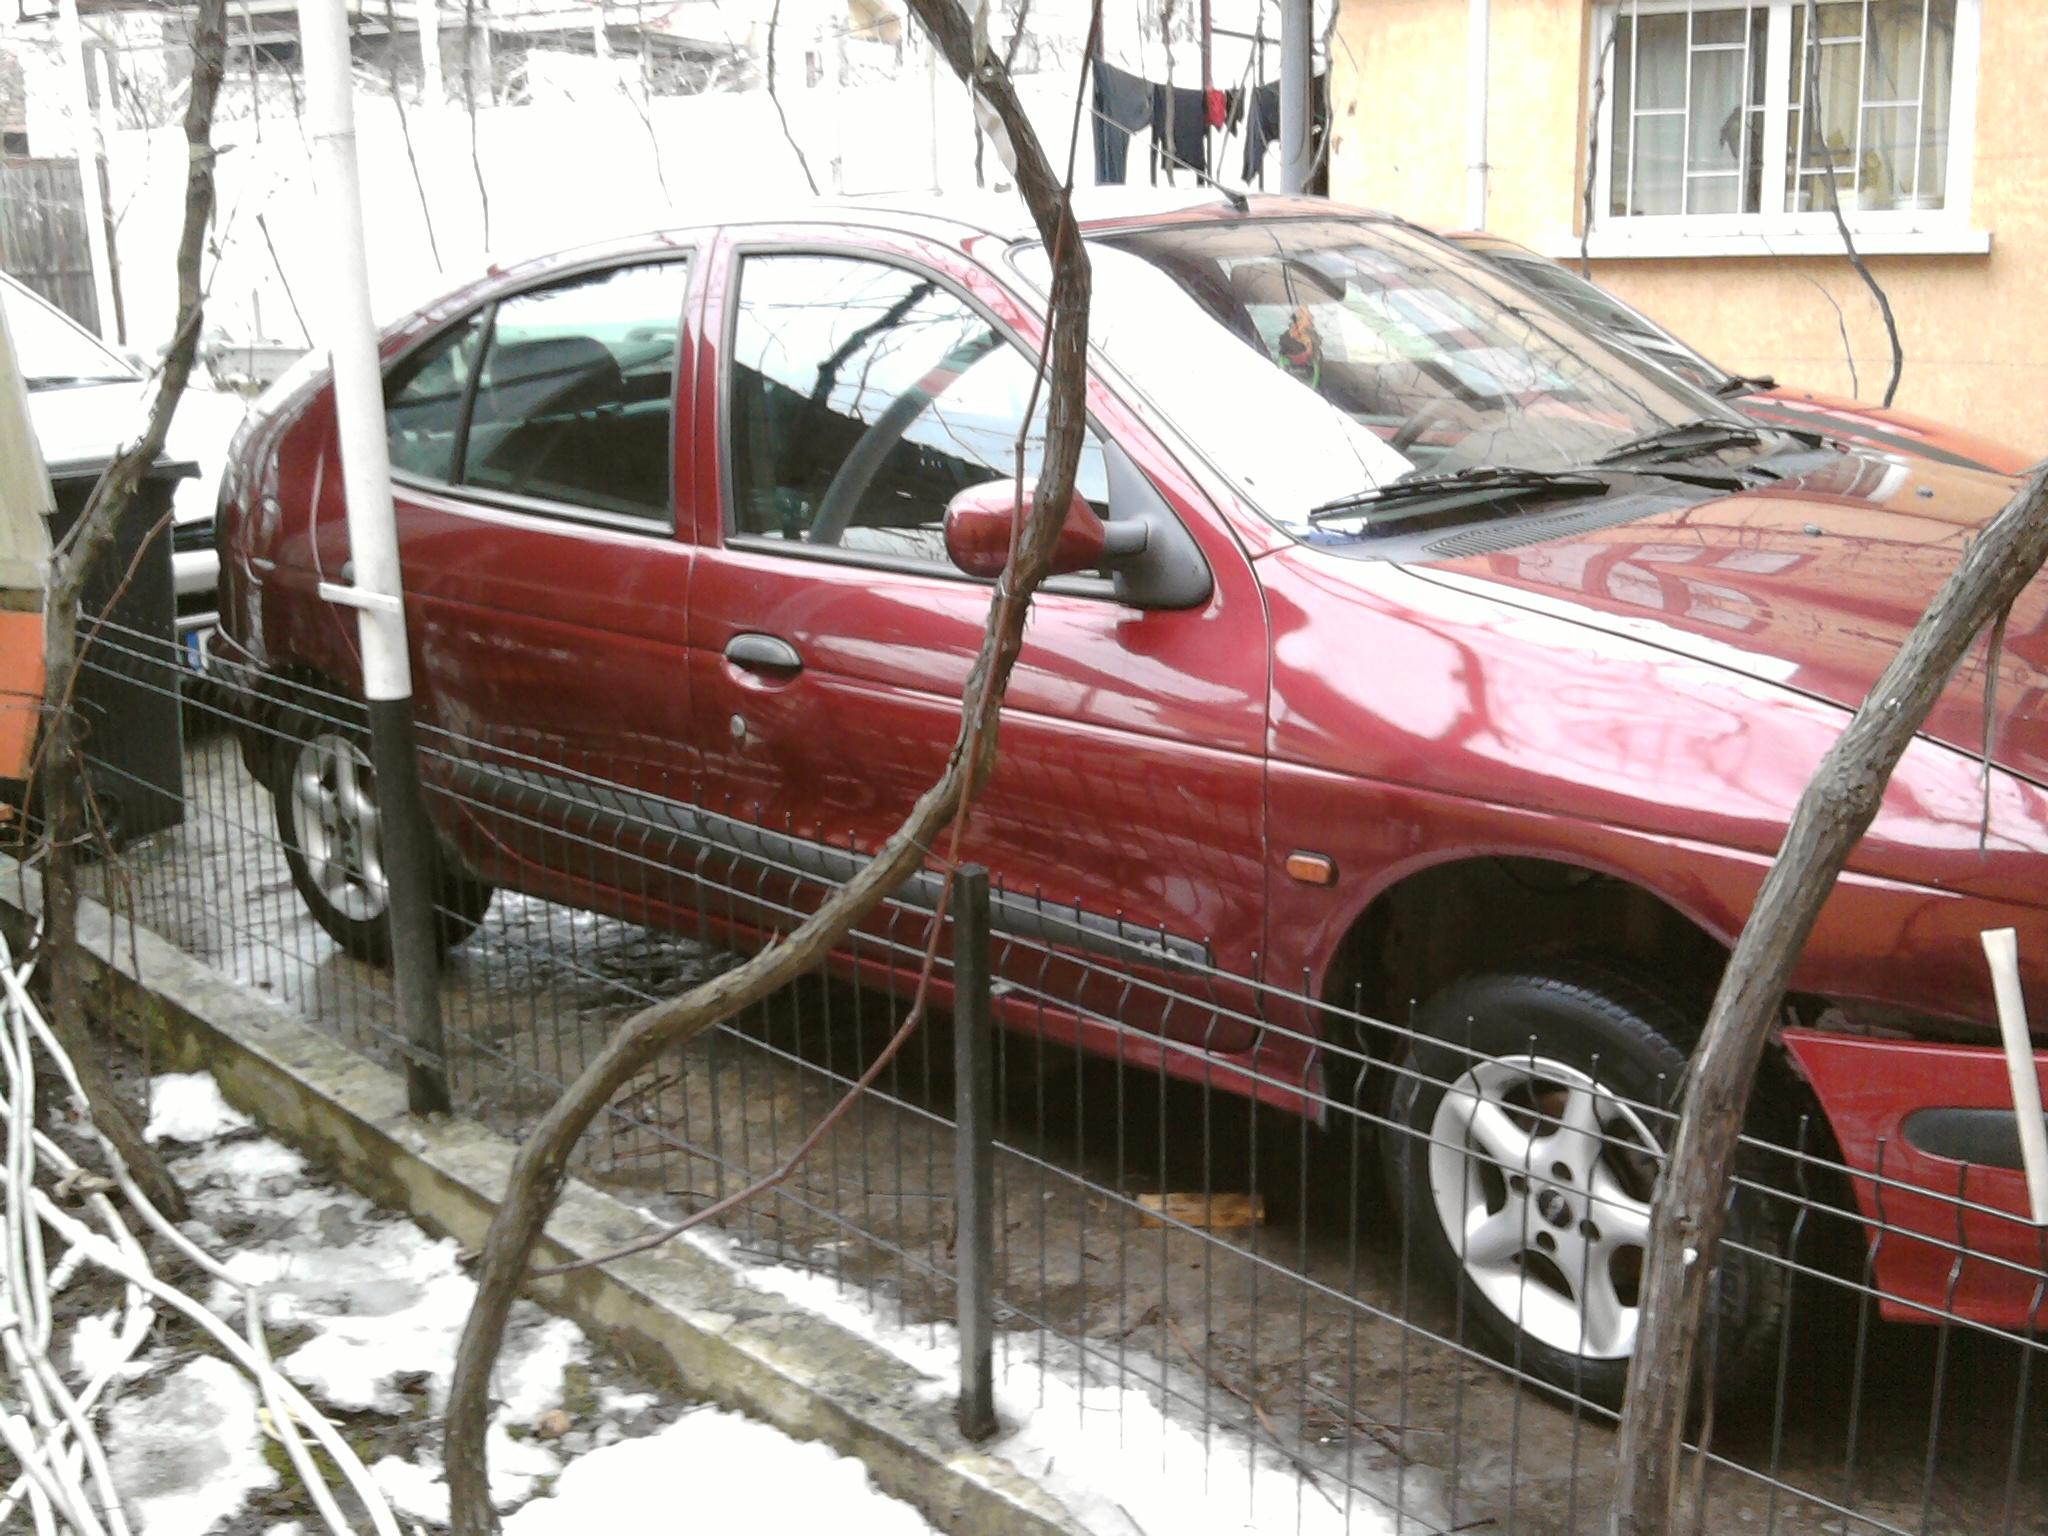 Renault Megane avariat 1995 Benzina Berlina - 14 Februarie 2011 - Poza 2